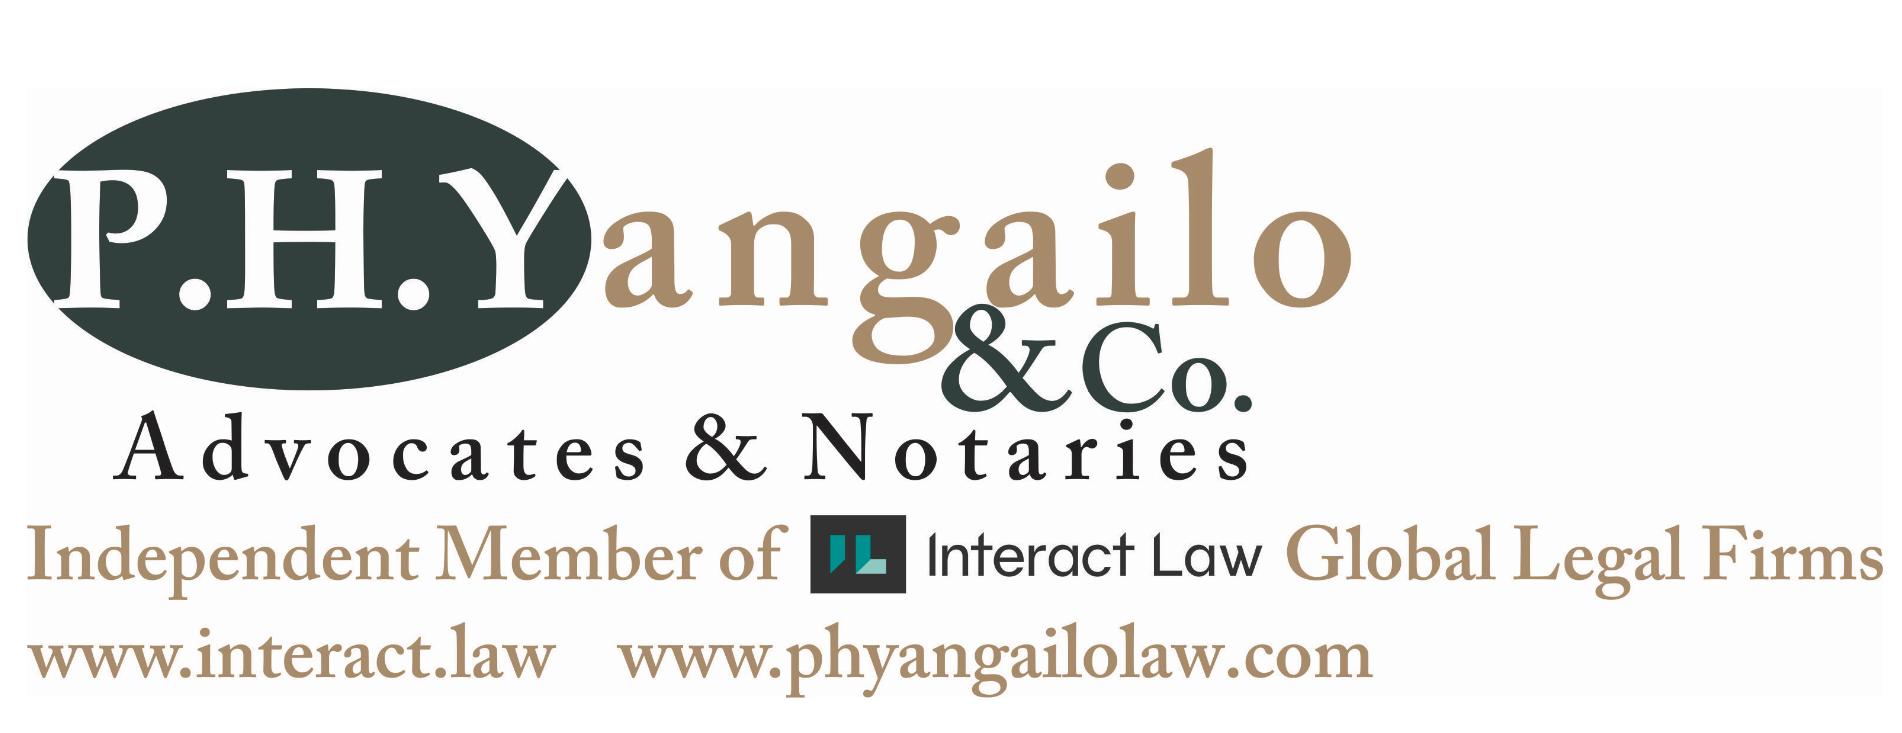 P.H. Yangailo & Co. logo